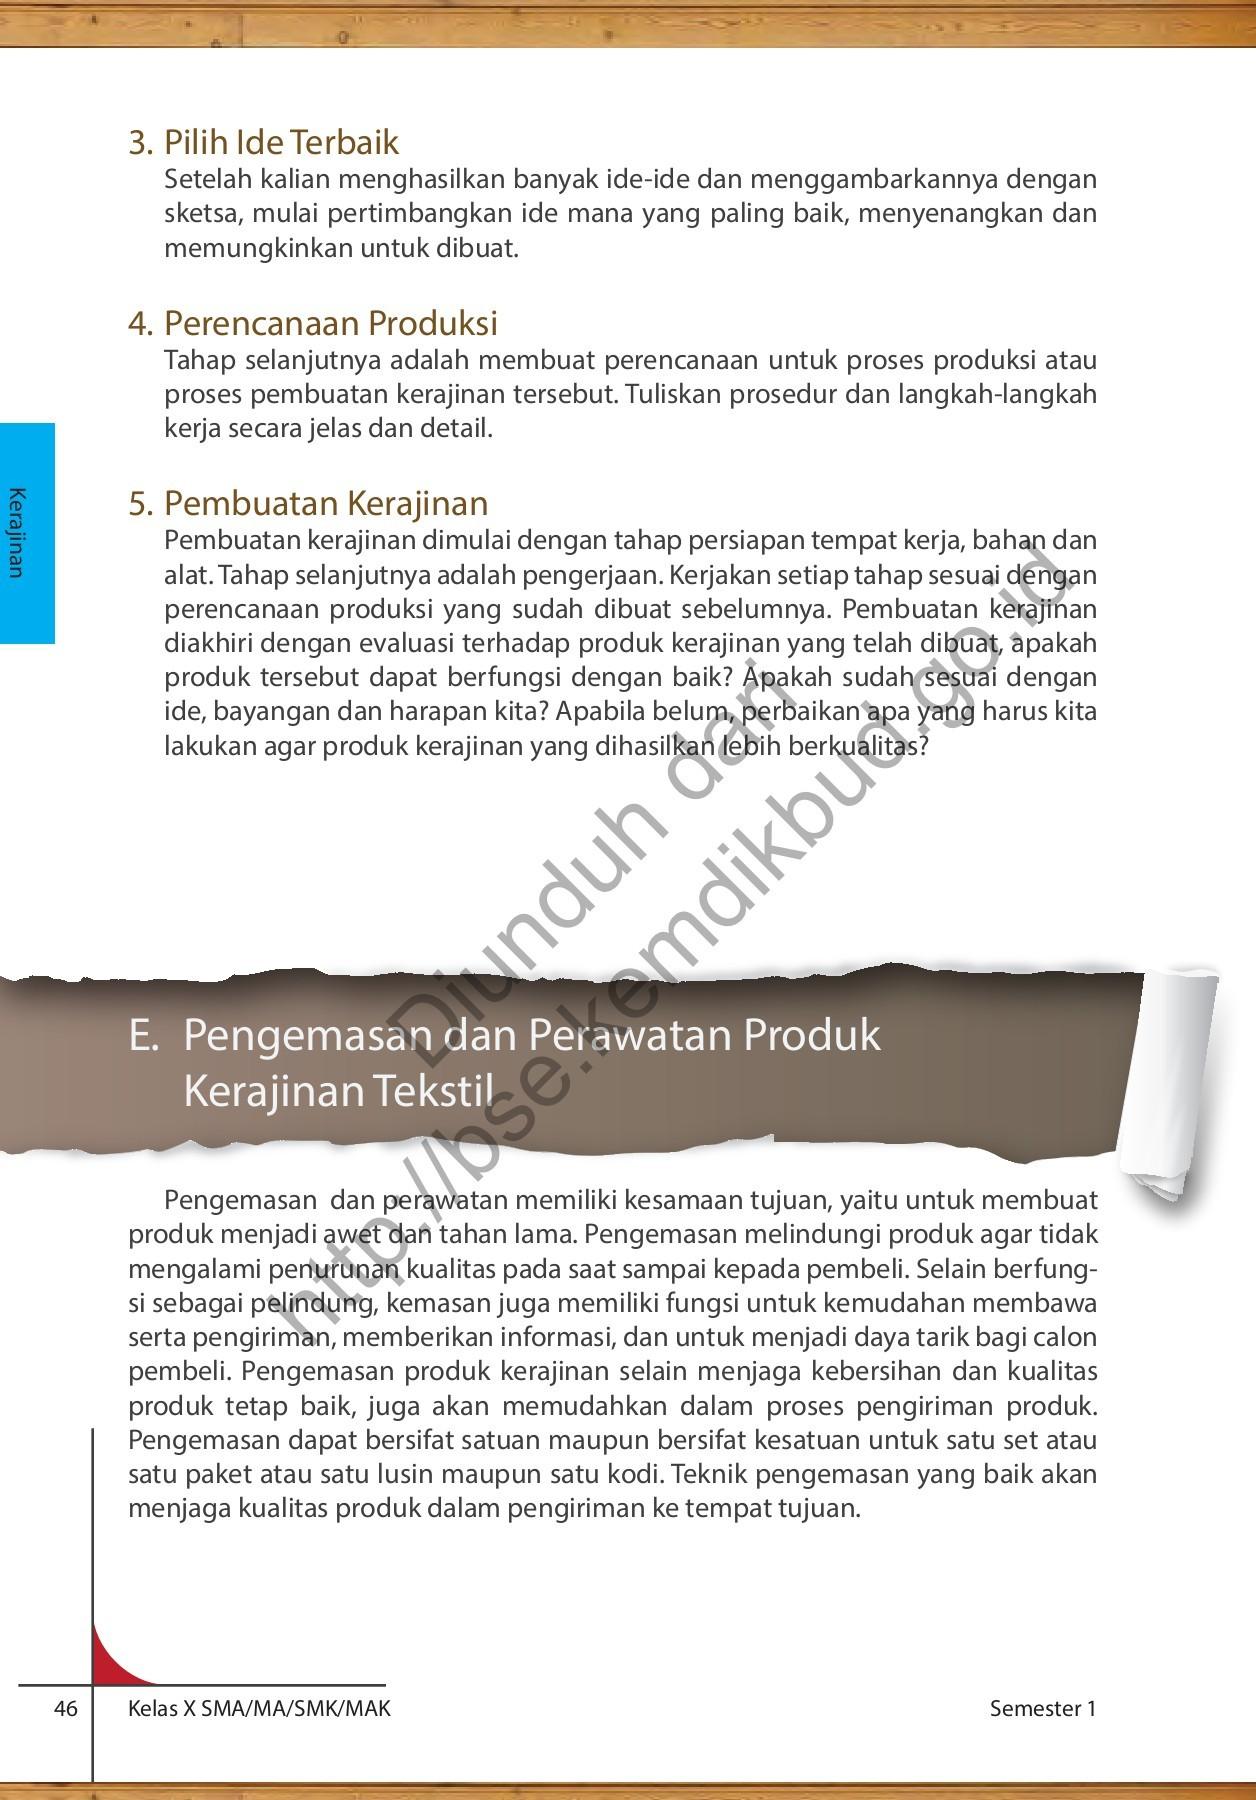 Proses Pembuatan Kerajinan Tekstil : proses, pembuatan, kerajinan, tekstil, Kelas10_prakarya_dan_kewirausahaan_buku_siswa_1646, Pages, Download, FlipHTML5